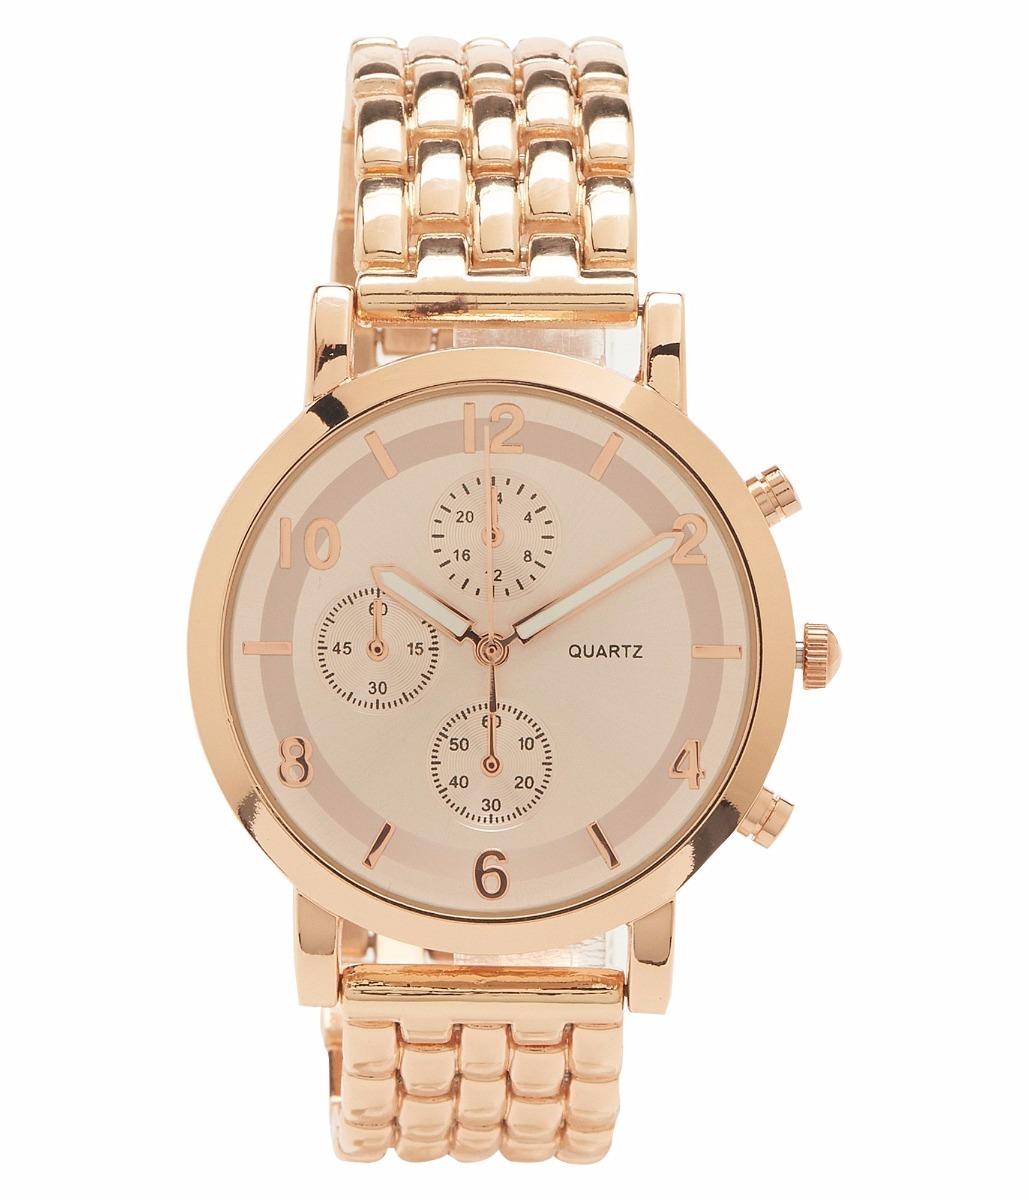 6c08356ead5 relógio feminino - aeropostale original barato frete grátis! Carregando zoom .